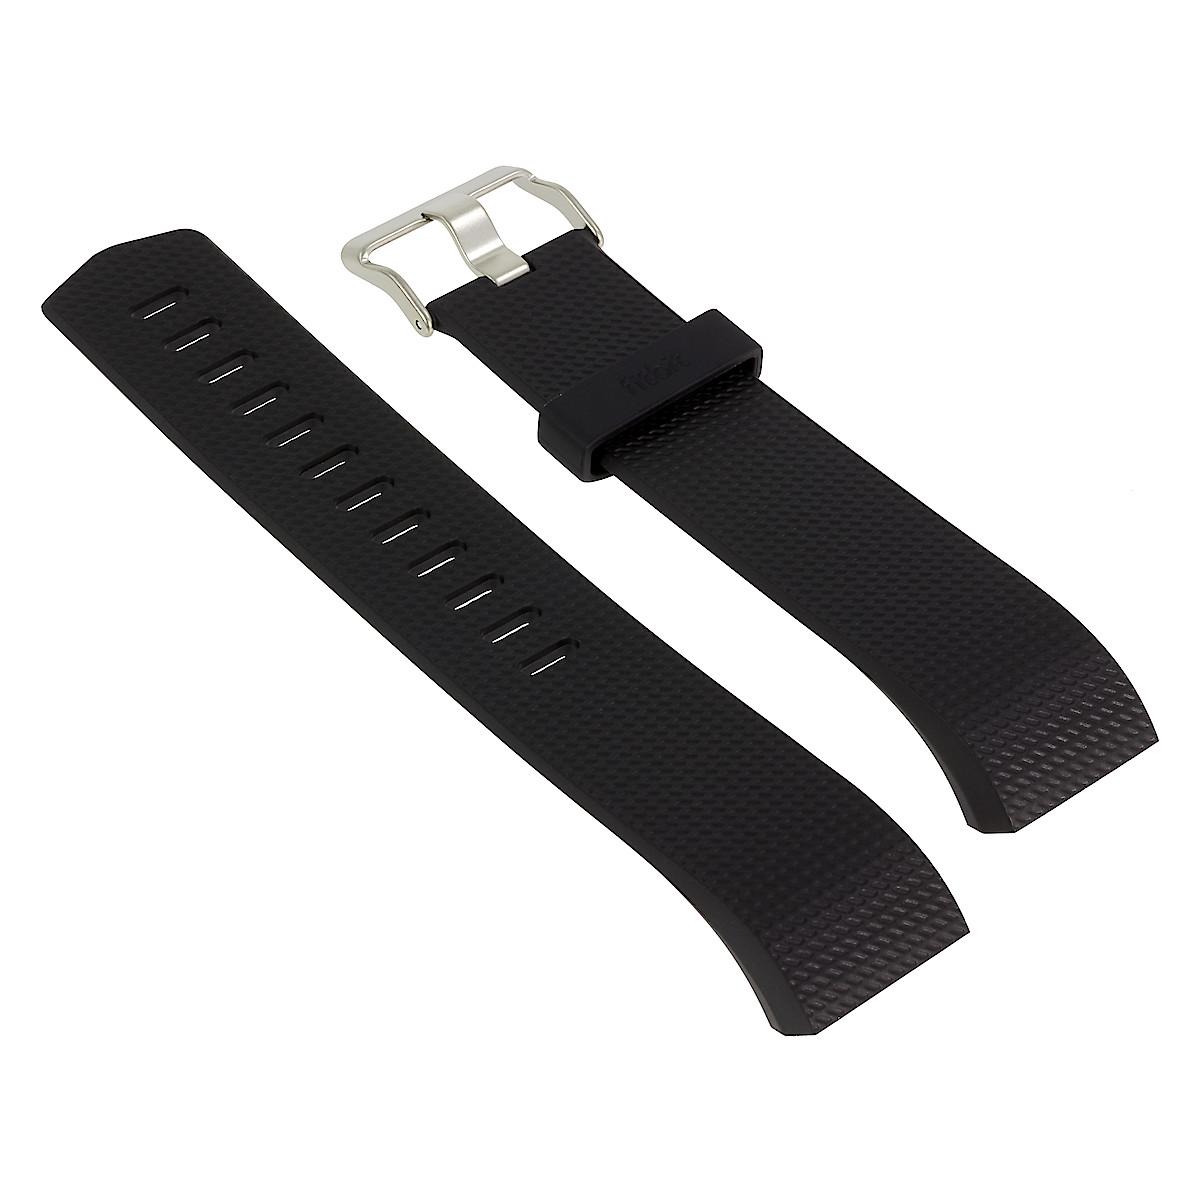 Kellon ranneke Fitbit Charge 2, Large